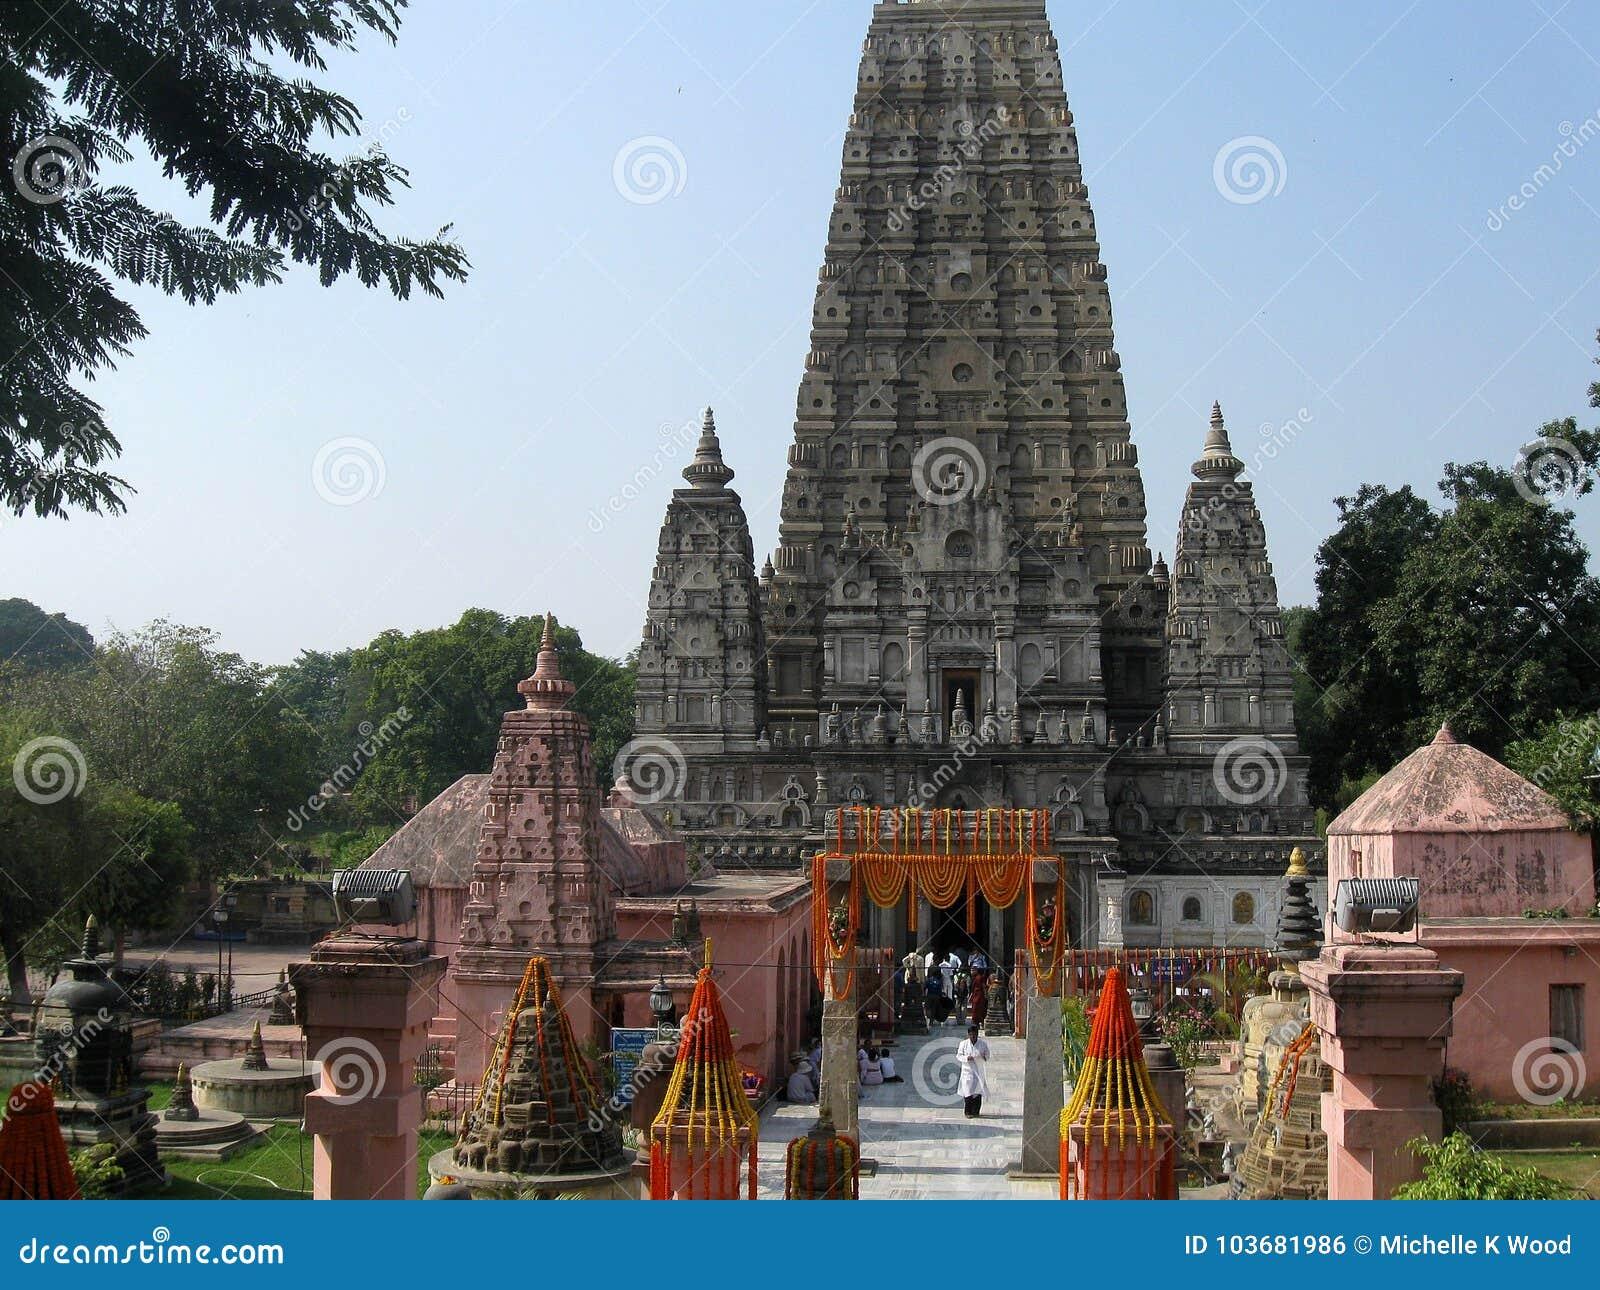 Great Buddha Mahabodhi Mahavihara Temple World Heritage Property